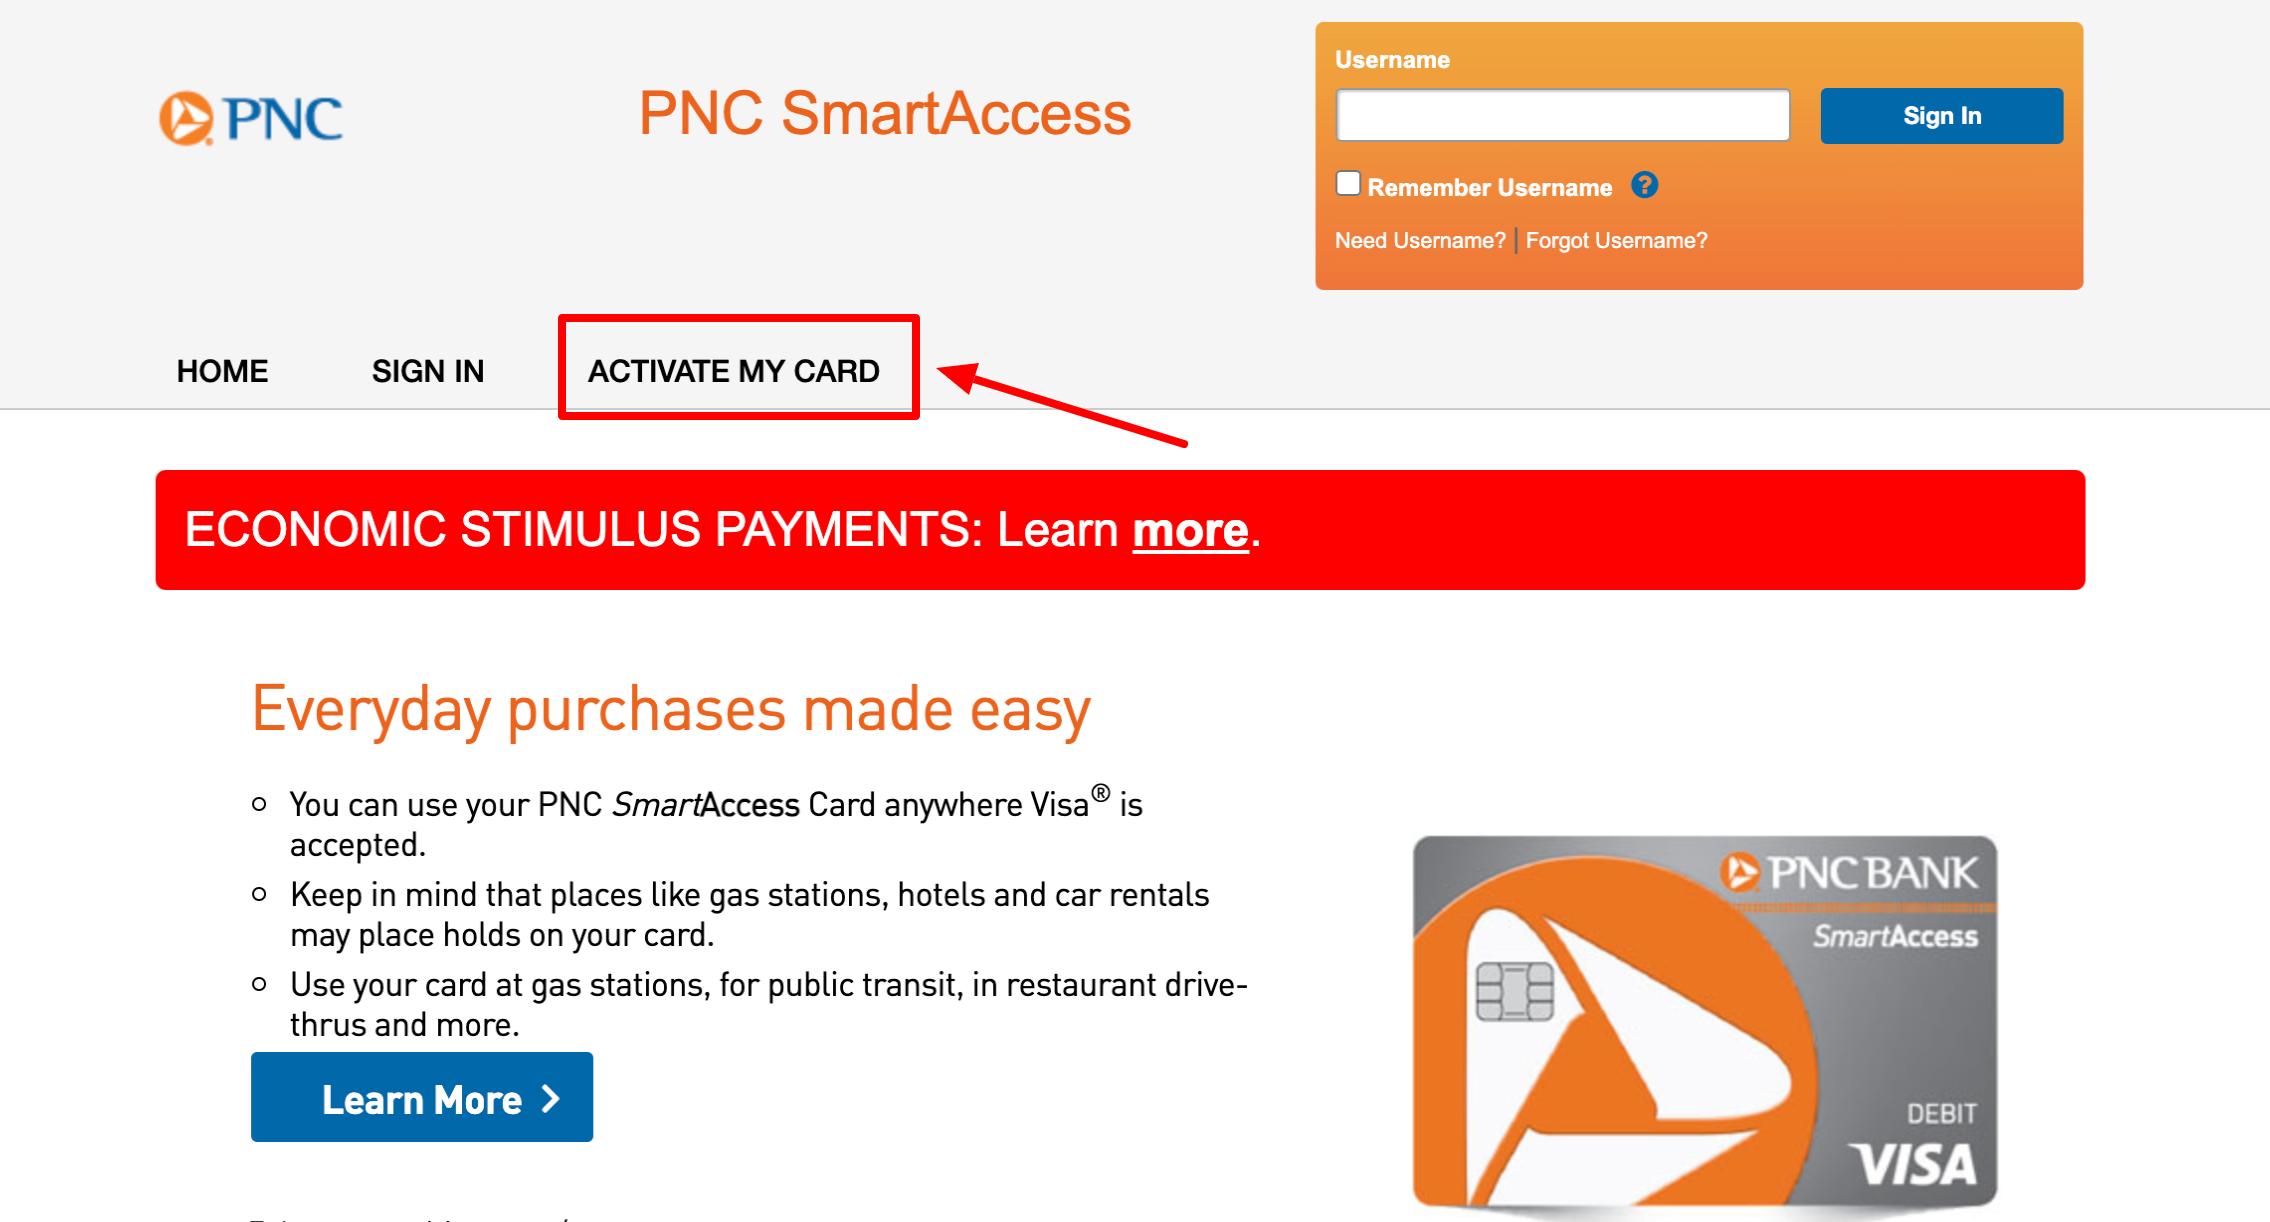 pnc smartaccess account activate card